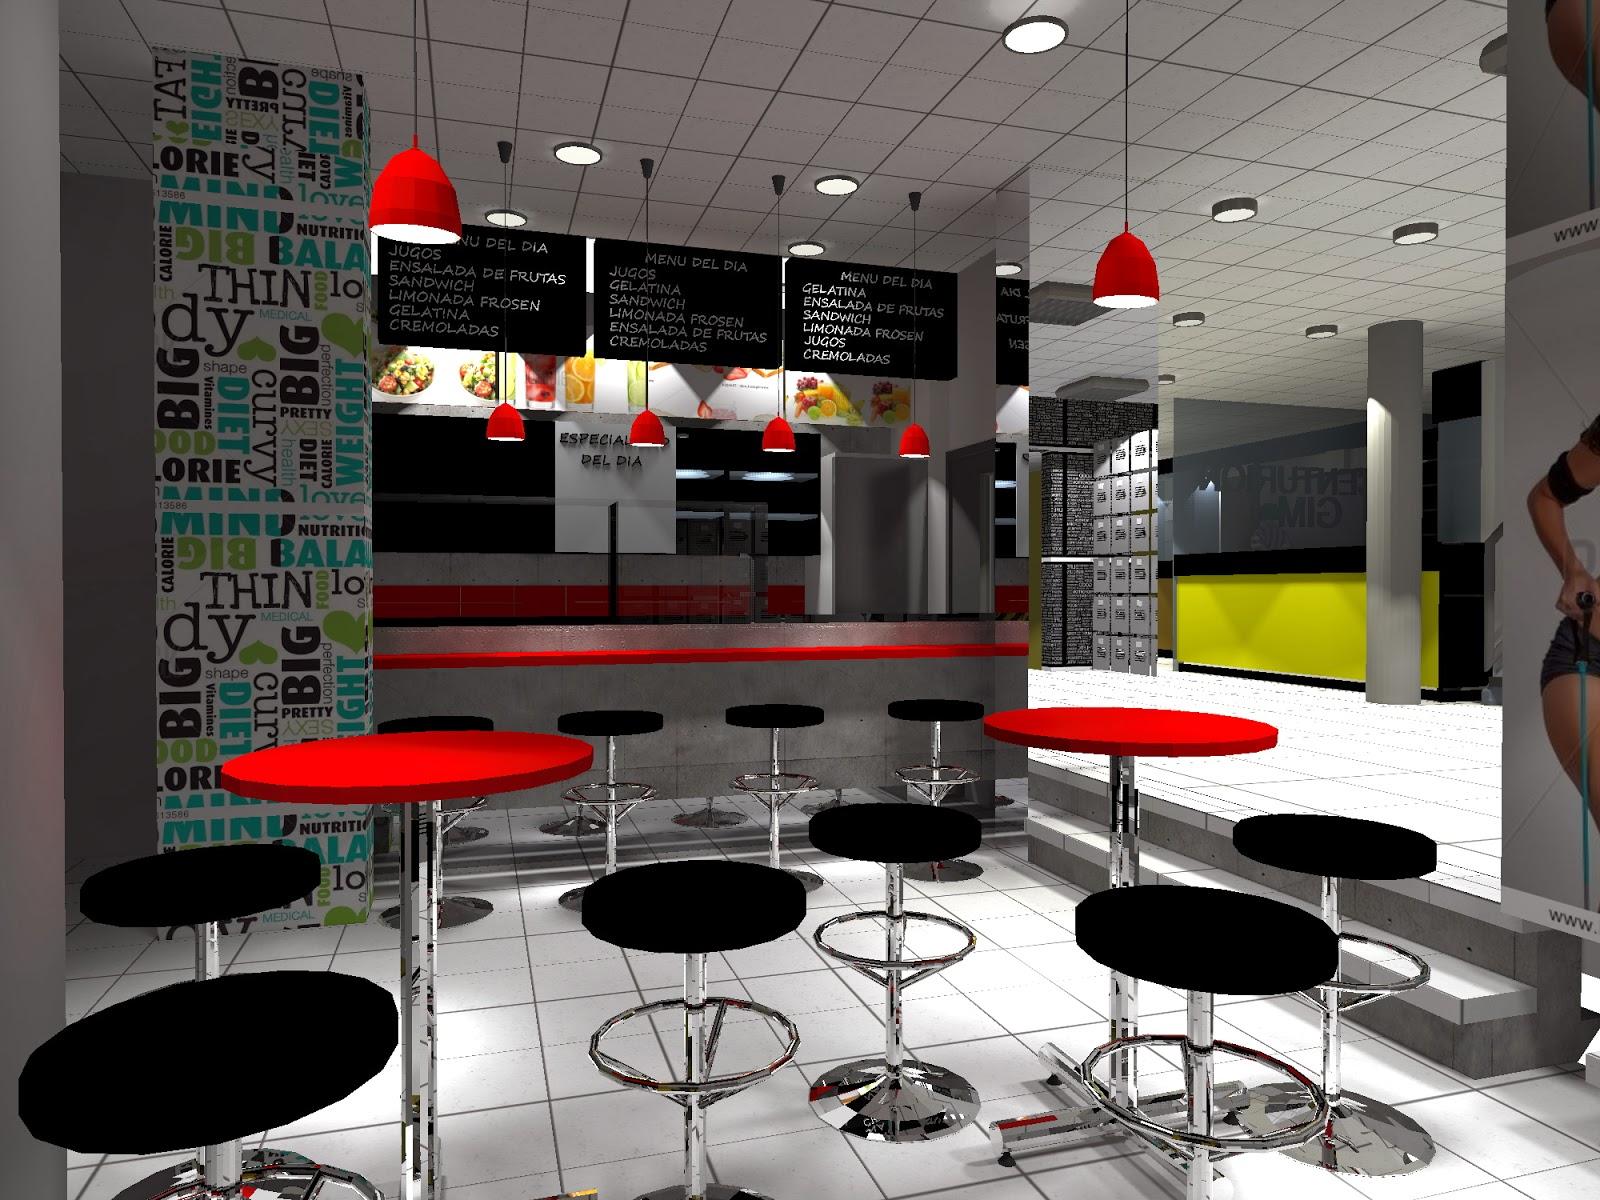 Muebles dise os y proyectos dise o de jugueria for Diseno de muebles 3d